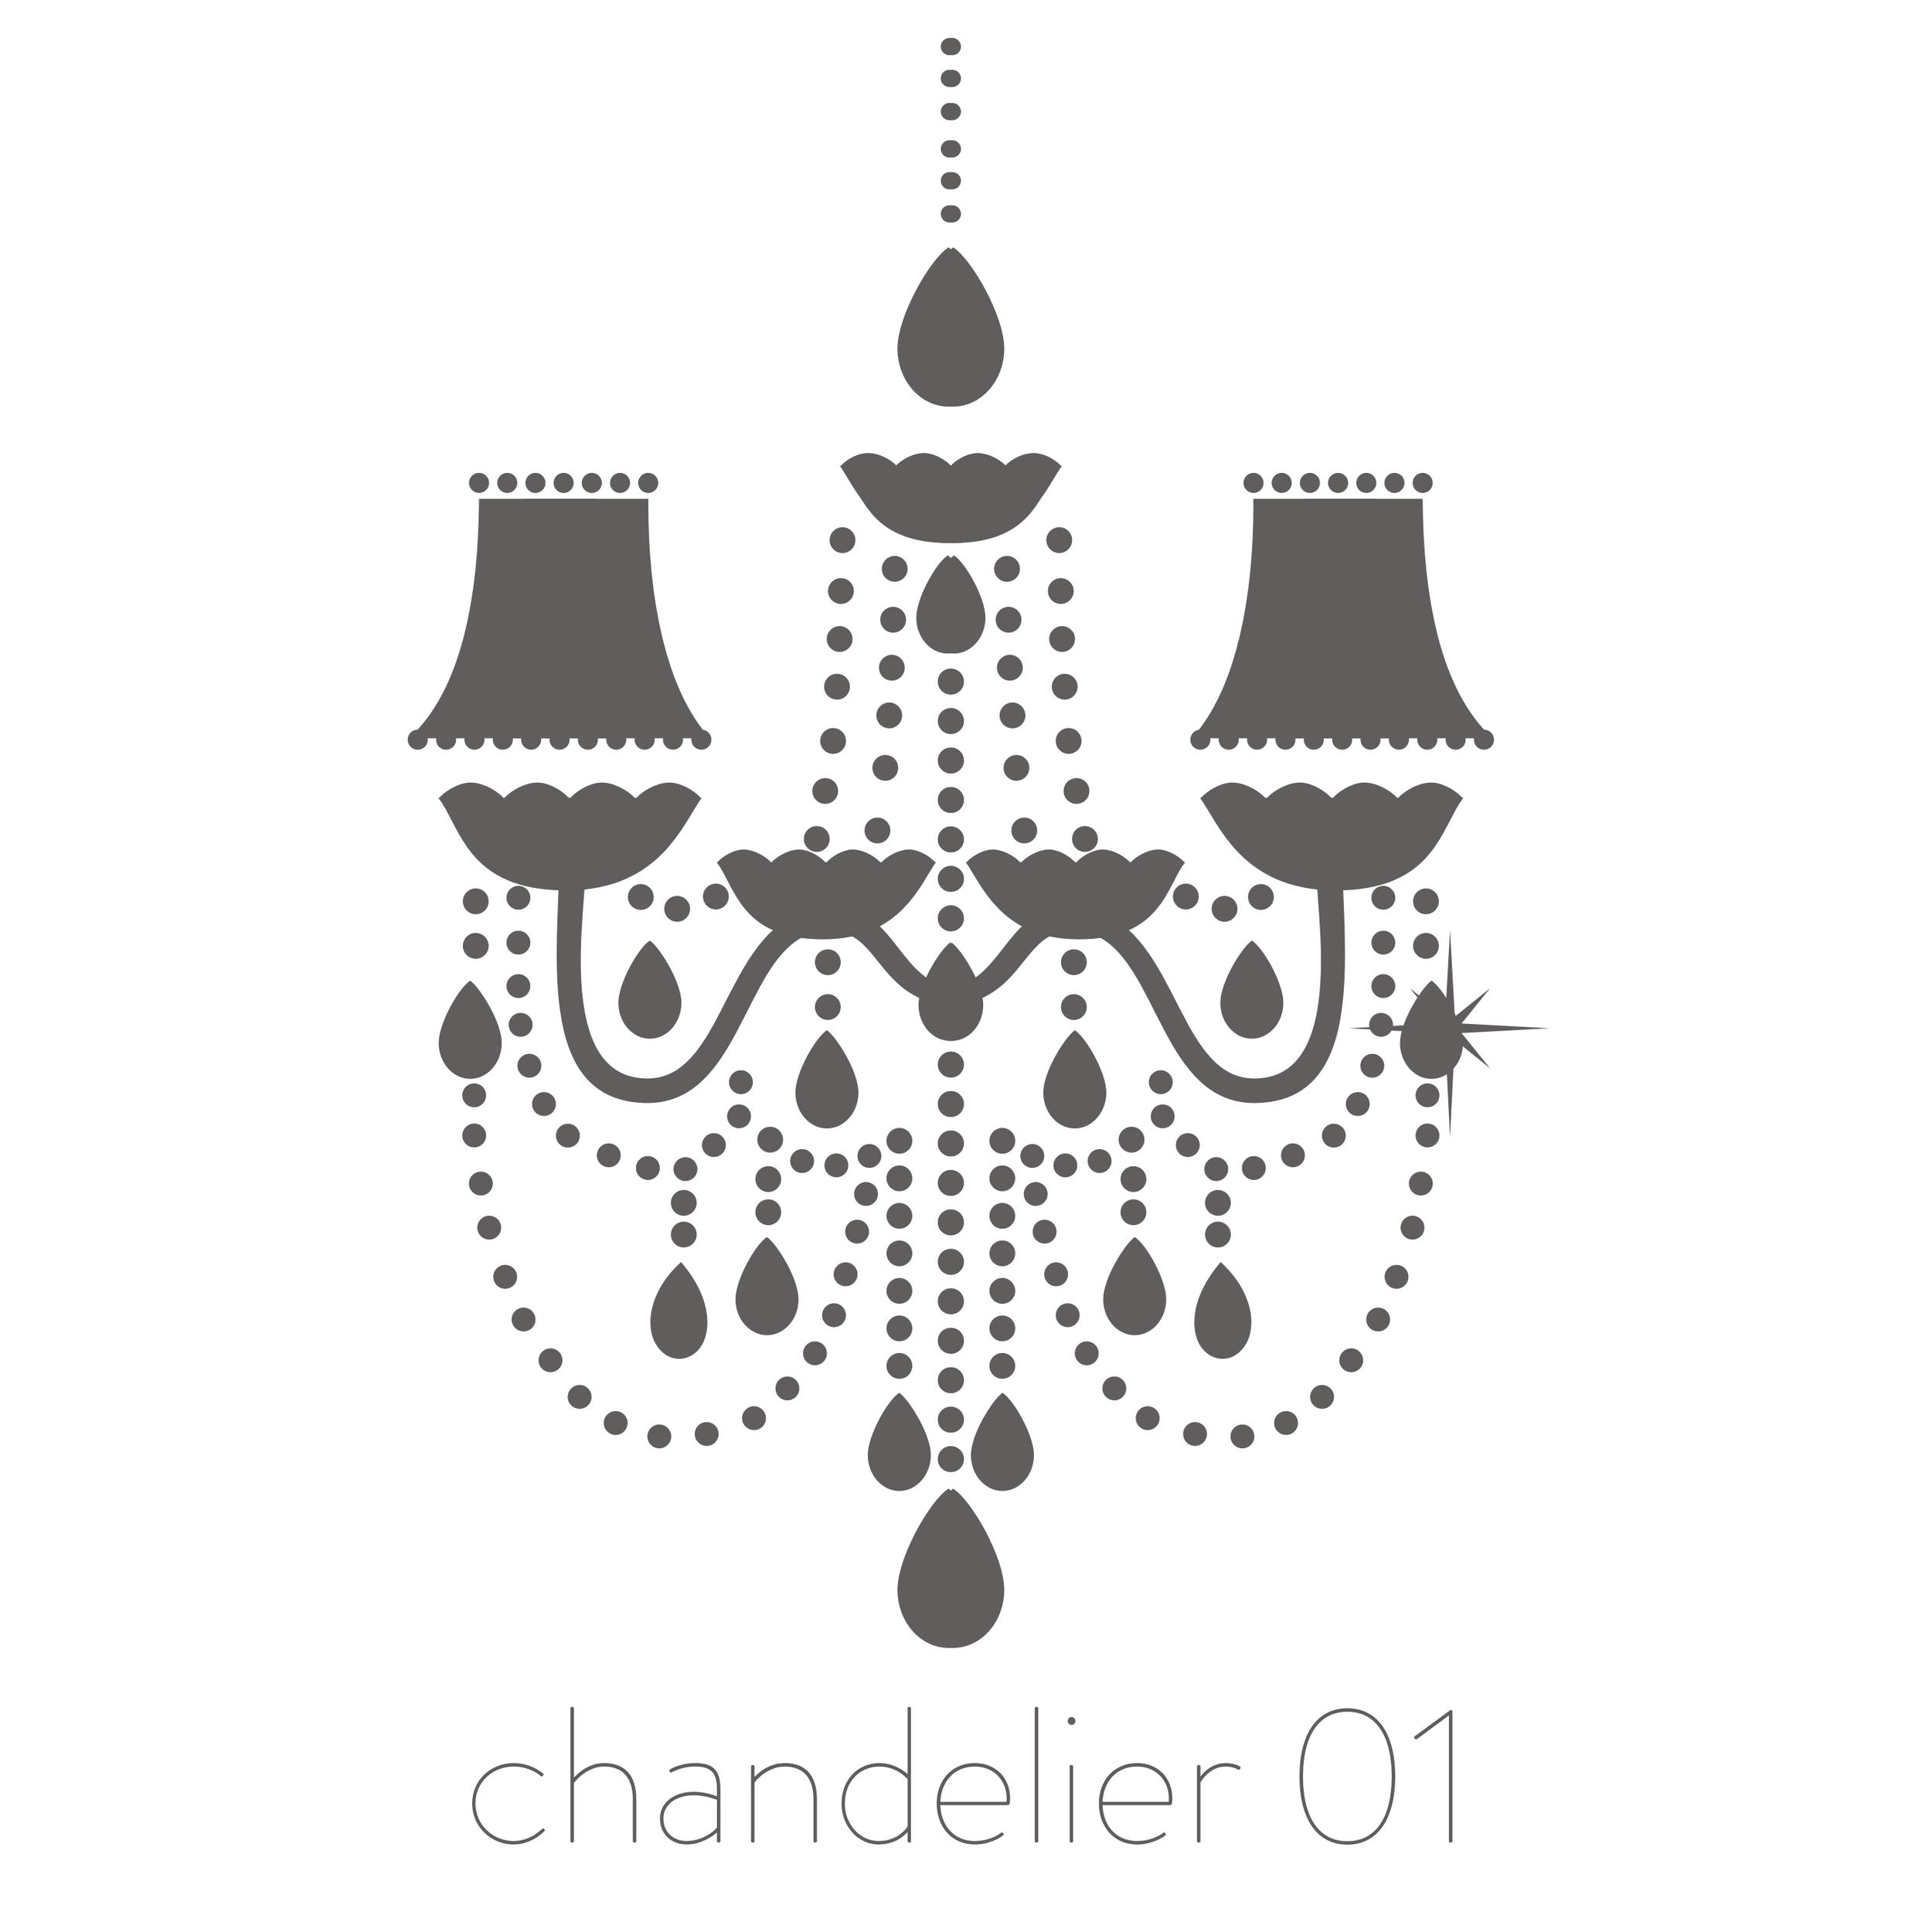 chandelier 01.png